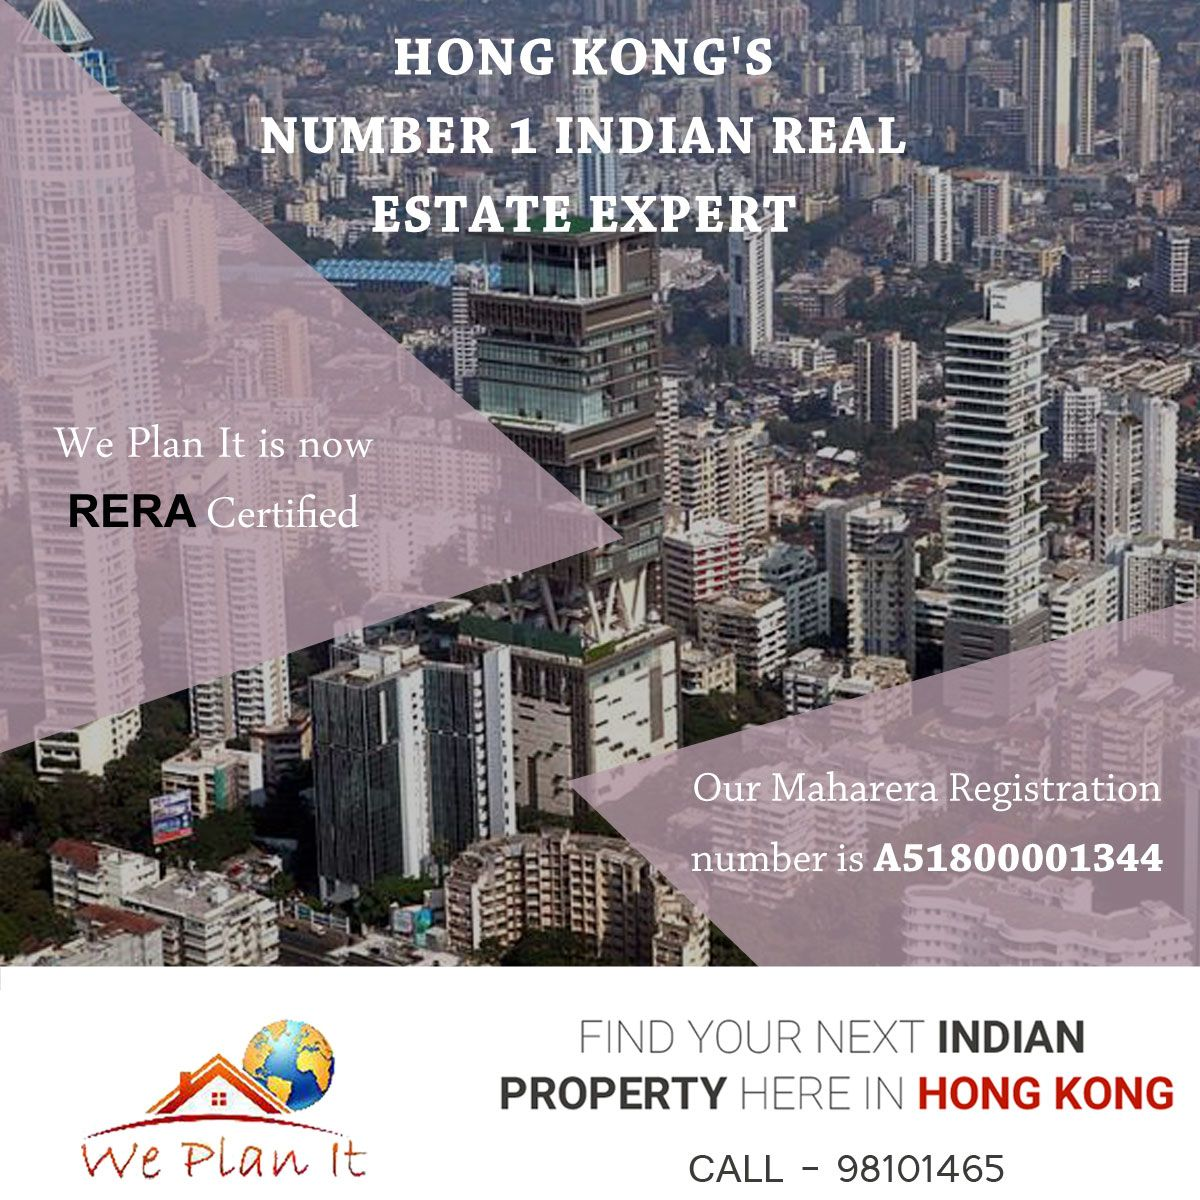 HONG KONG'S NUMBER 1 INDIAN REAL ESTATE EXPERT. Meet Us